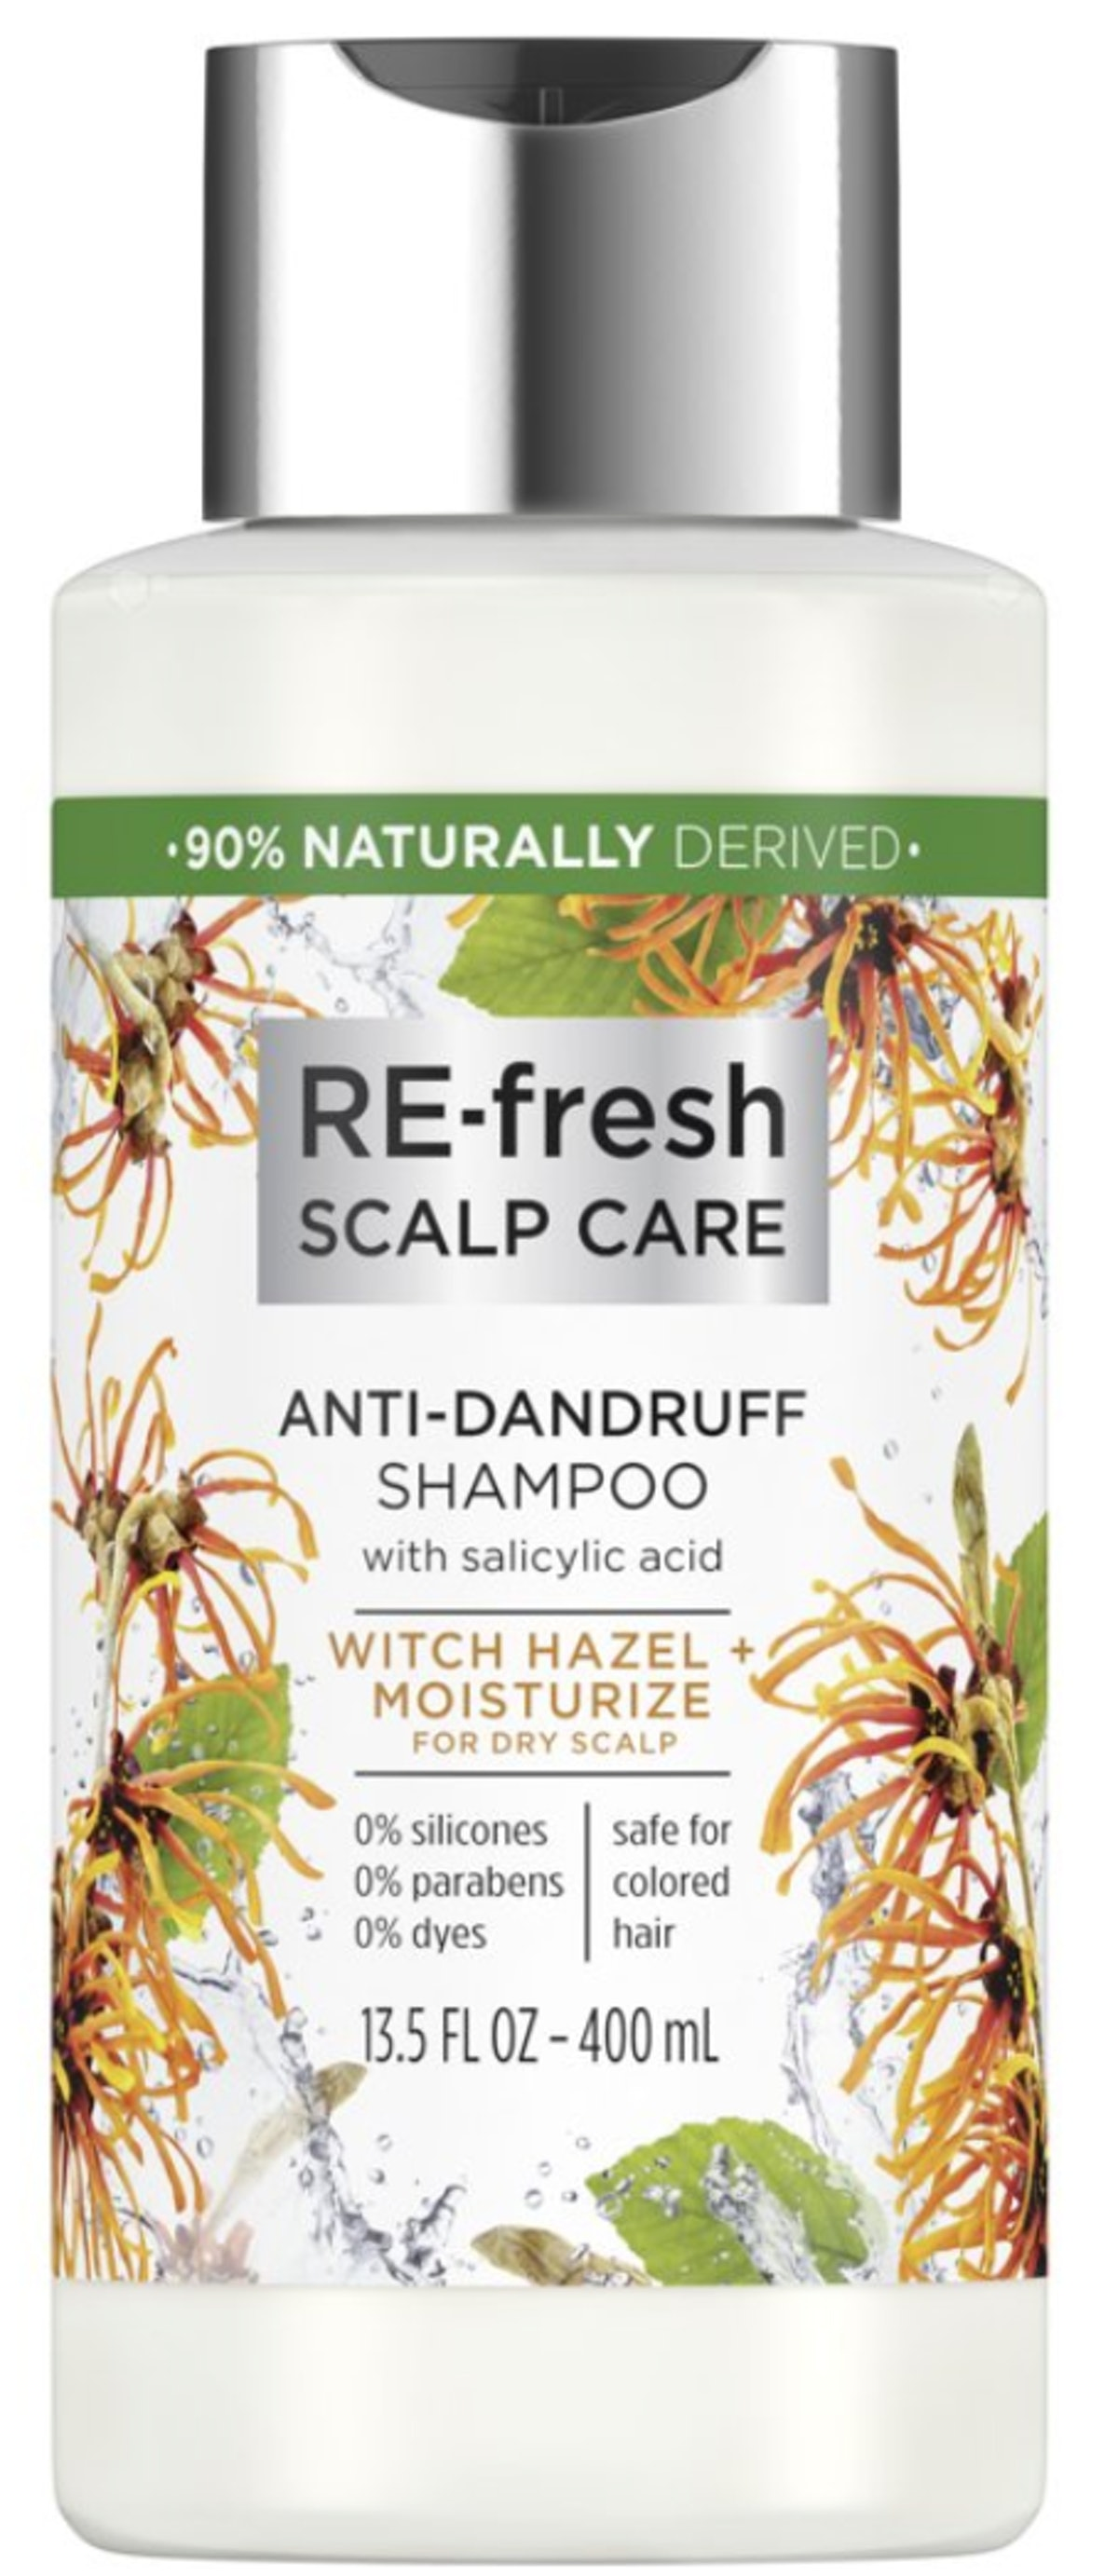 Scalp Care Anti-Dandruff Shampoo Witch Hazel,